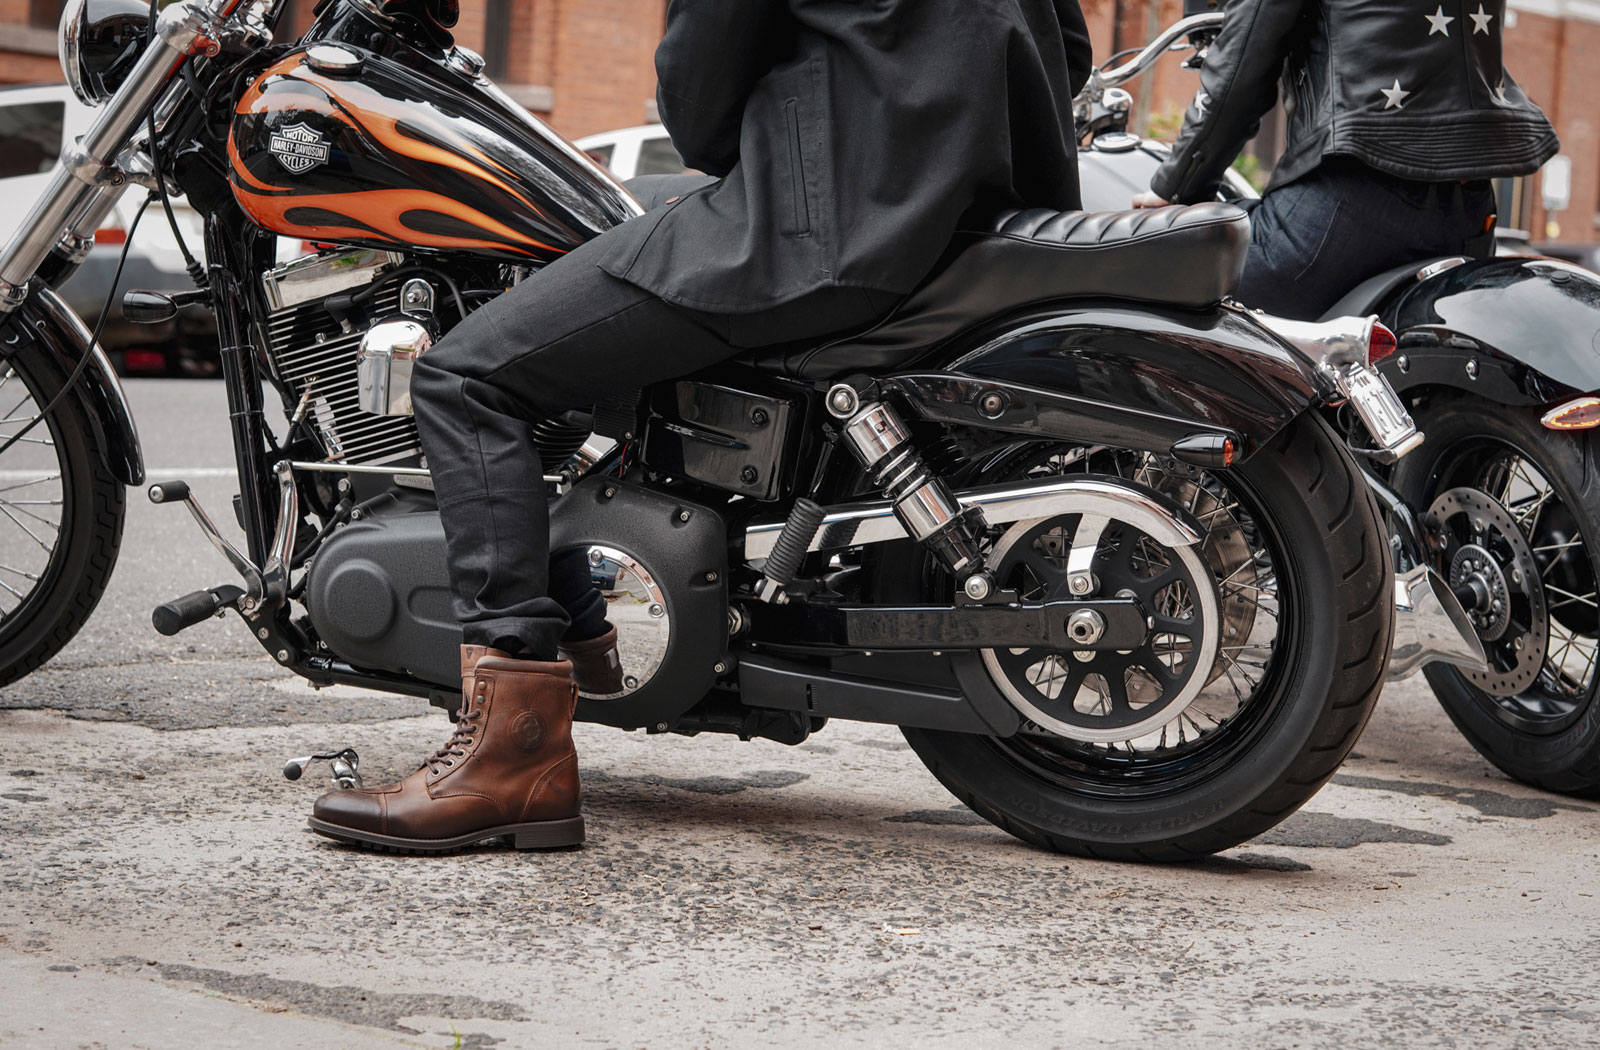 Clutch Moto motorcycle denim